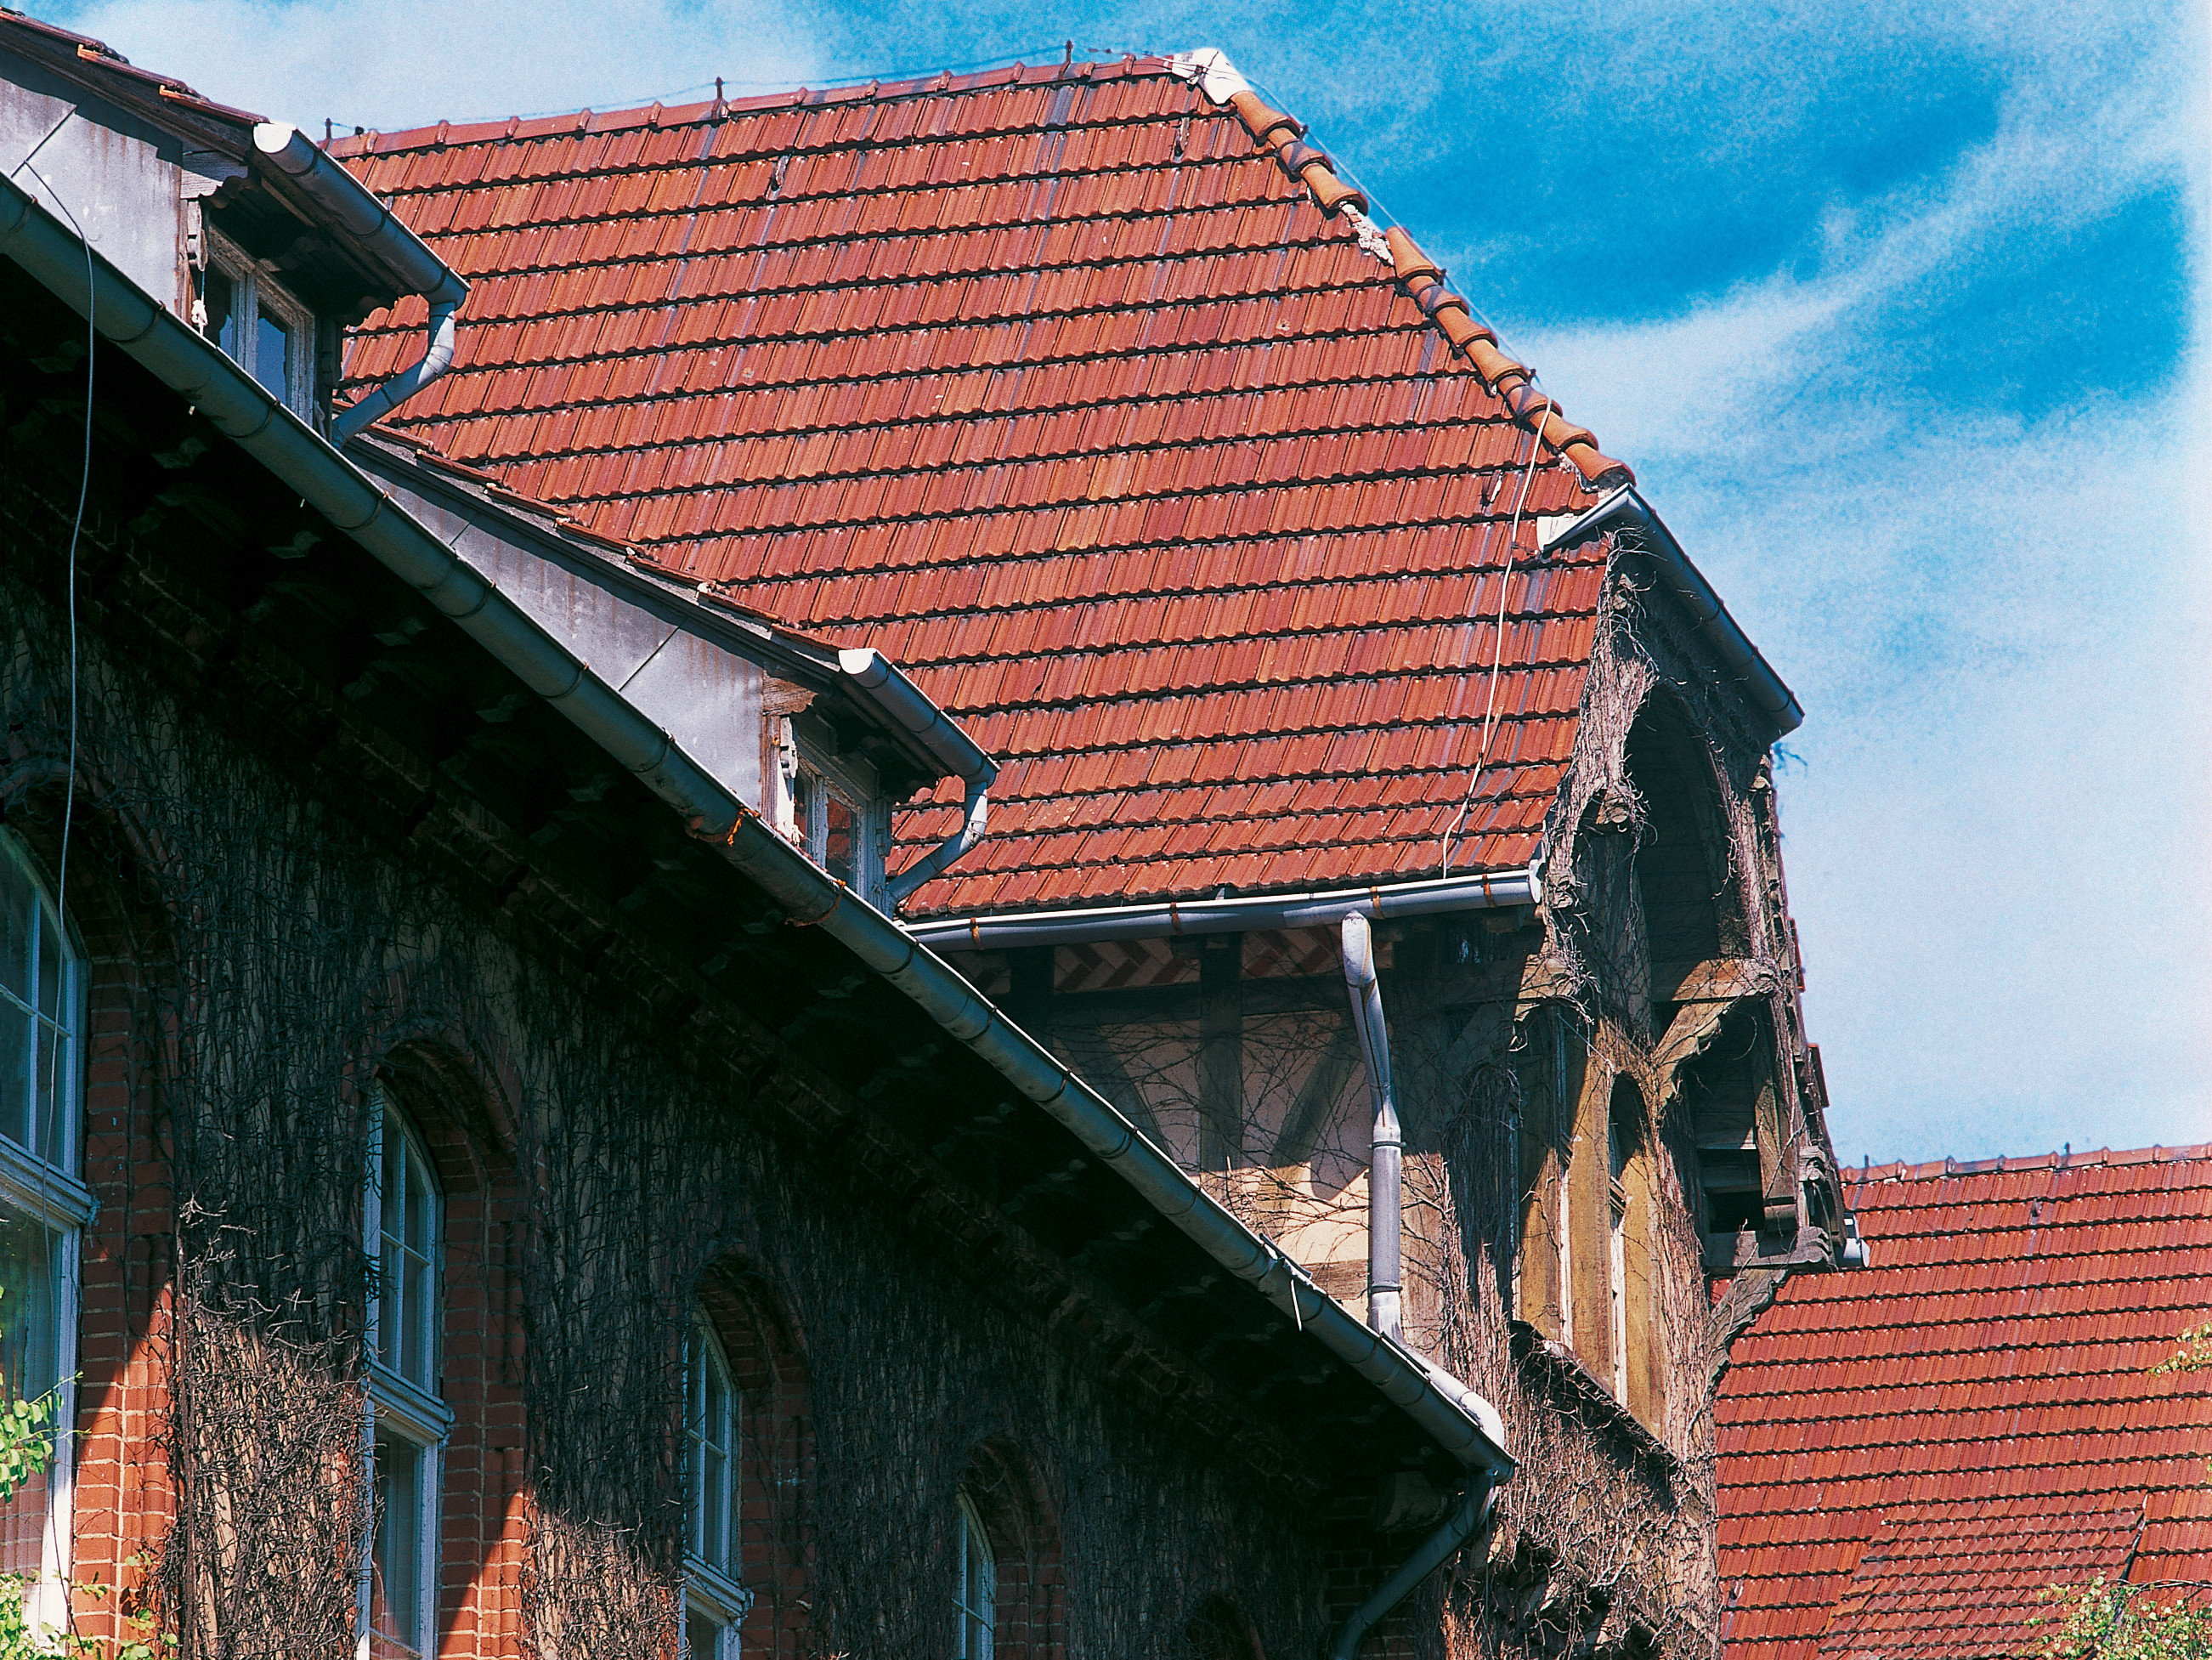 Longevity of clay roof tiles